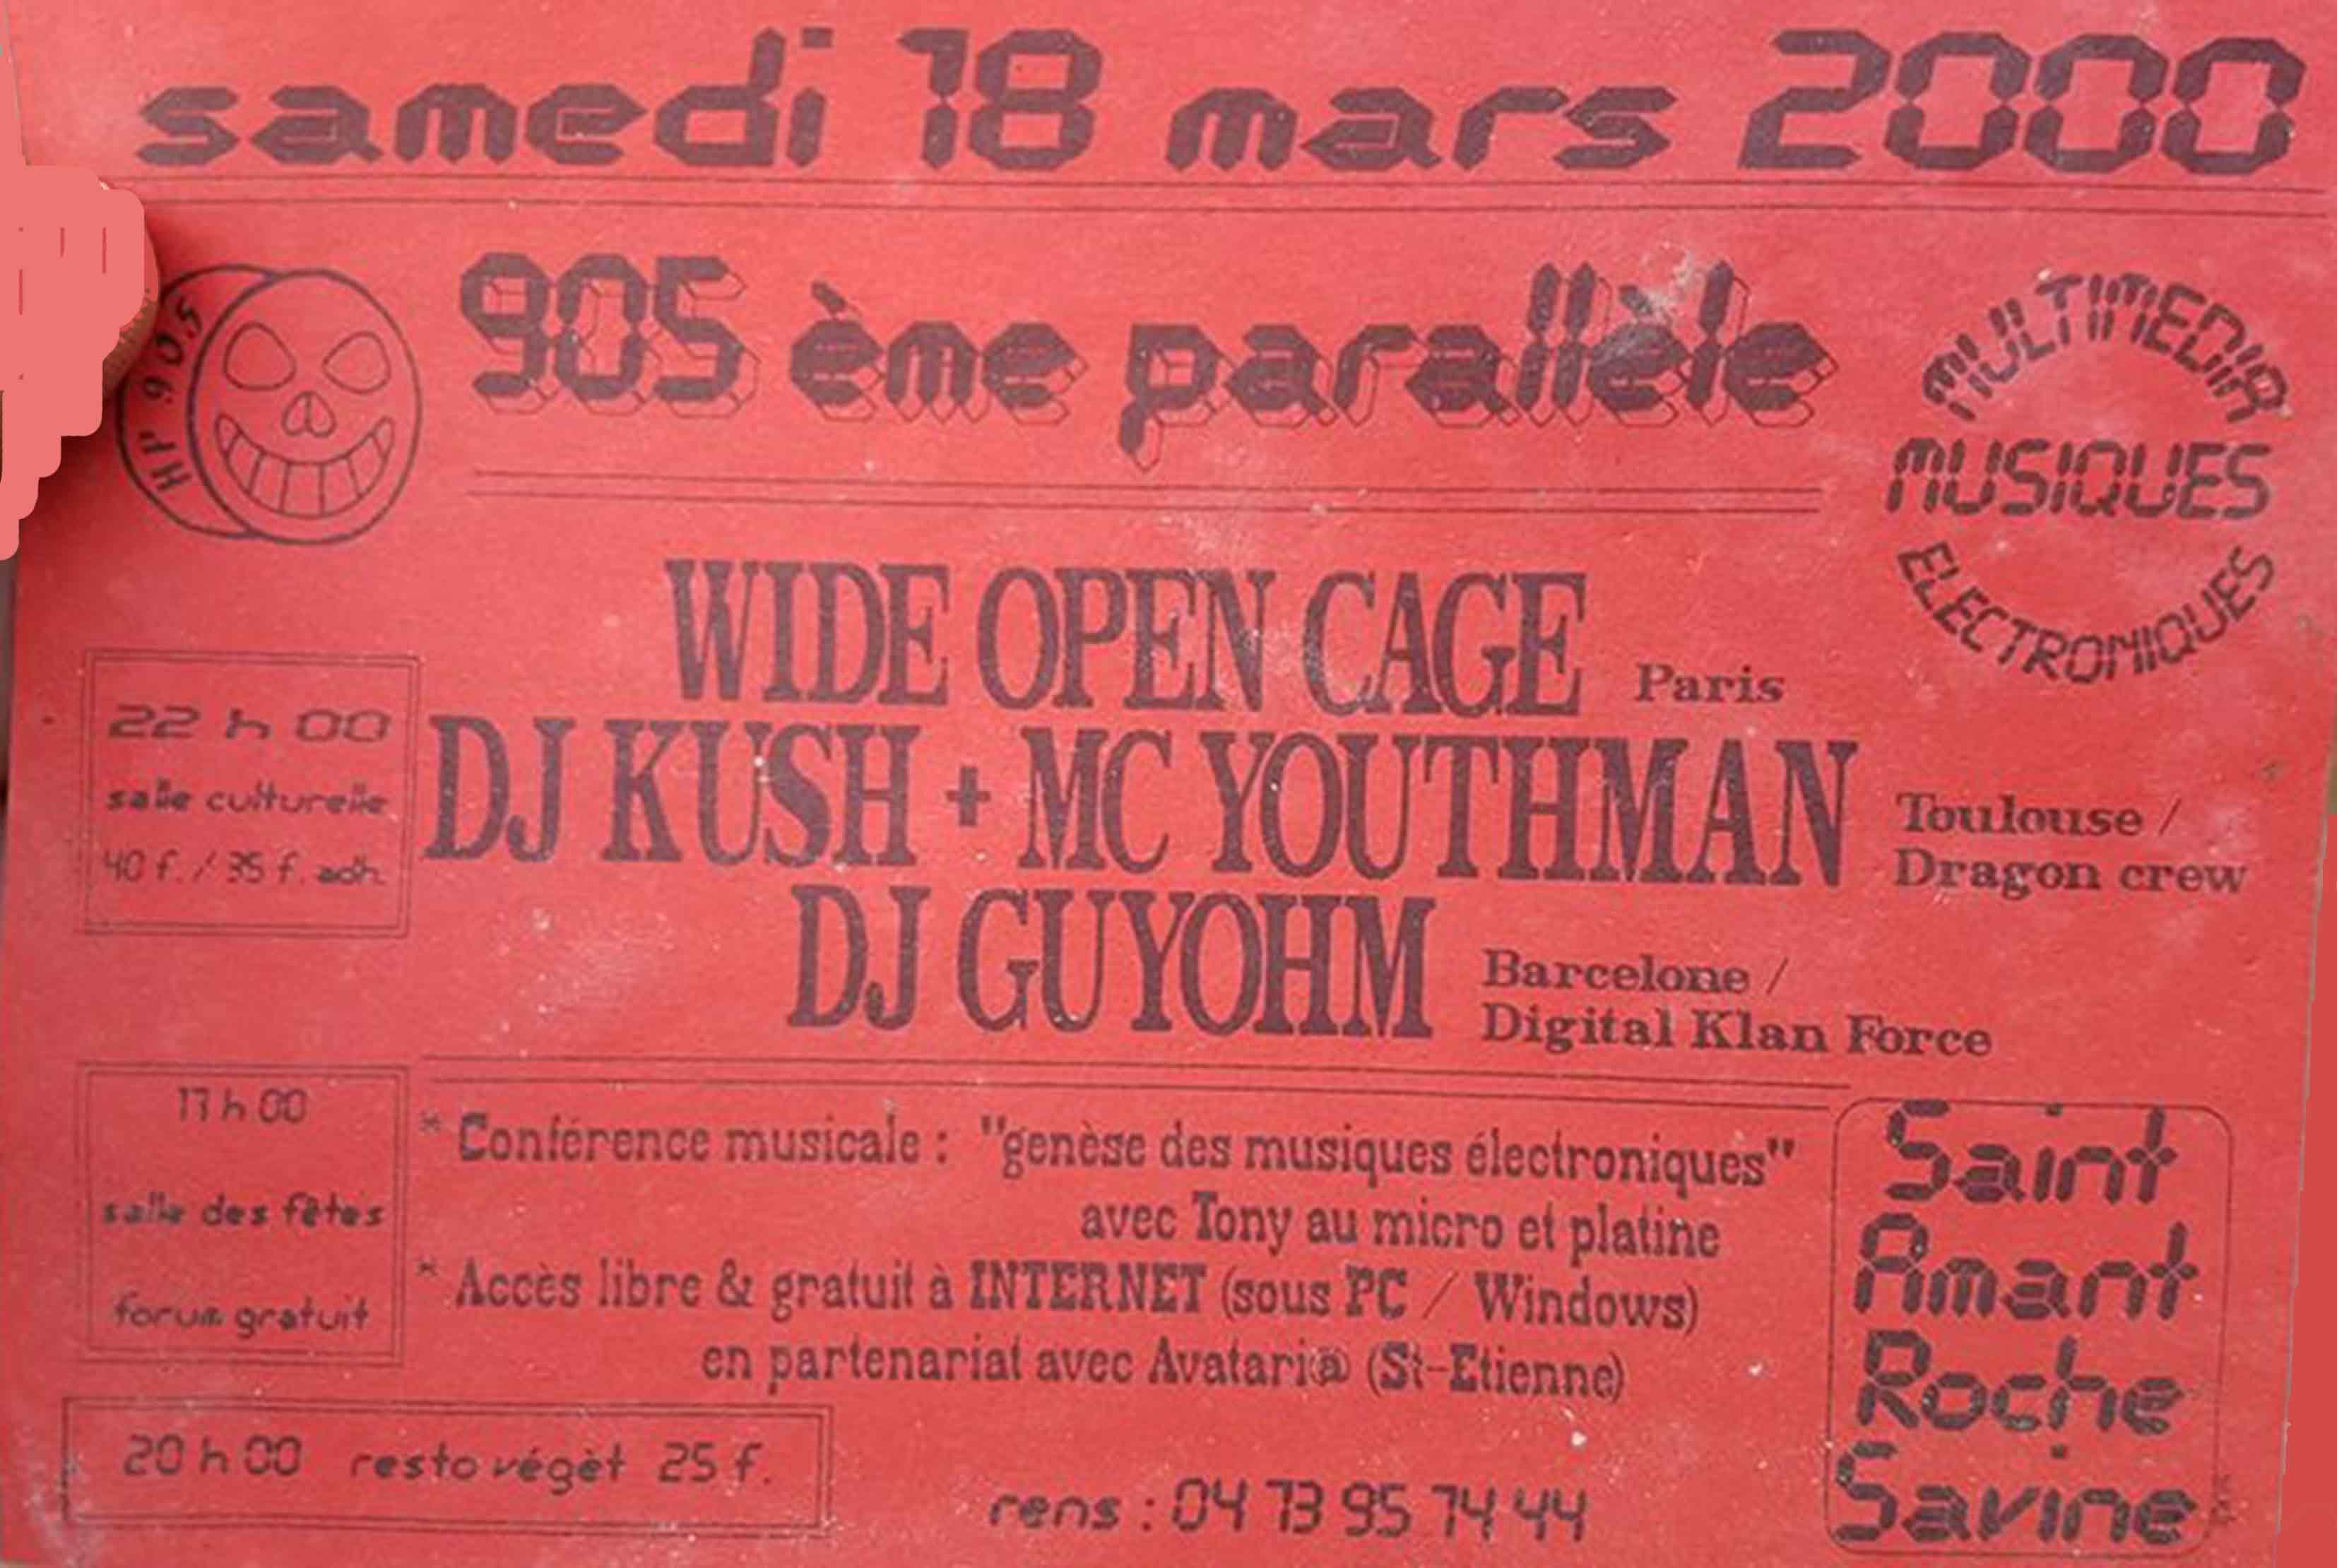 18 mars 2000 Wide Open Cage, DJ Krush, MC Youthman, DJ Guyohm à Saint Amant Roche Savine